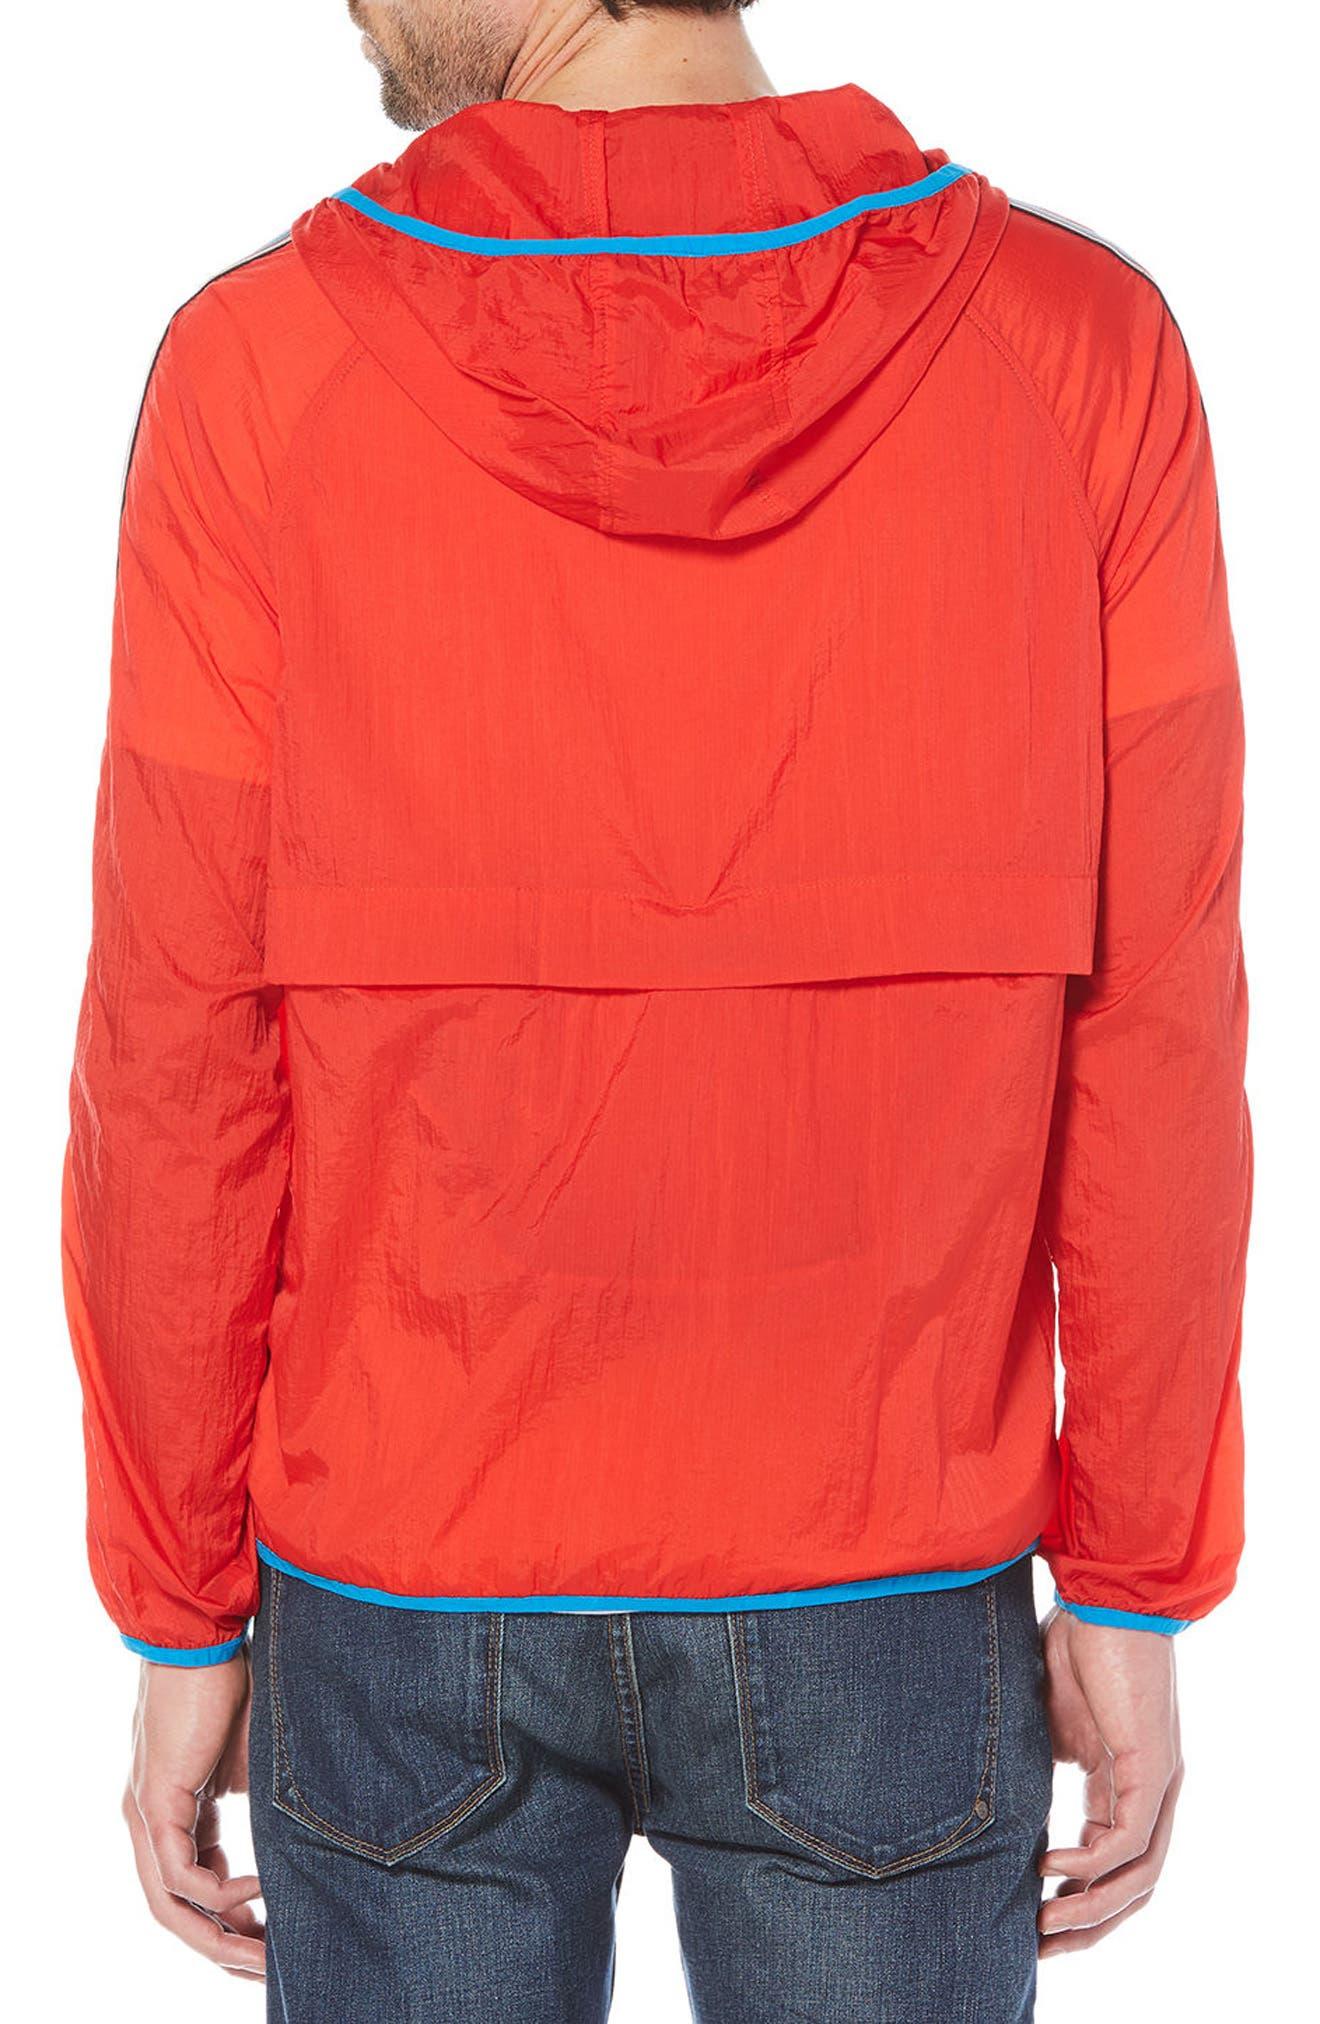 Lightweight Packable Jacket,                             Alternate thumbnail 2, color,                             Flame Scarlet